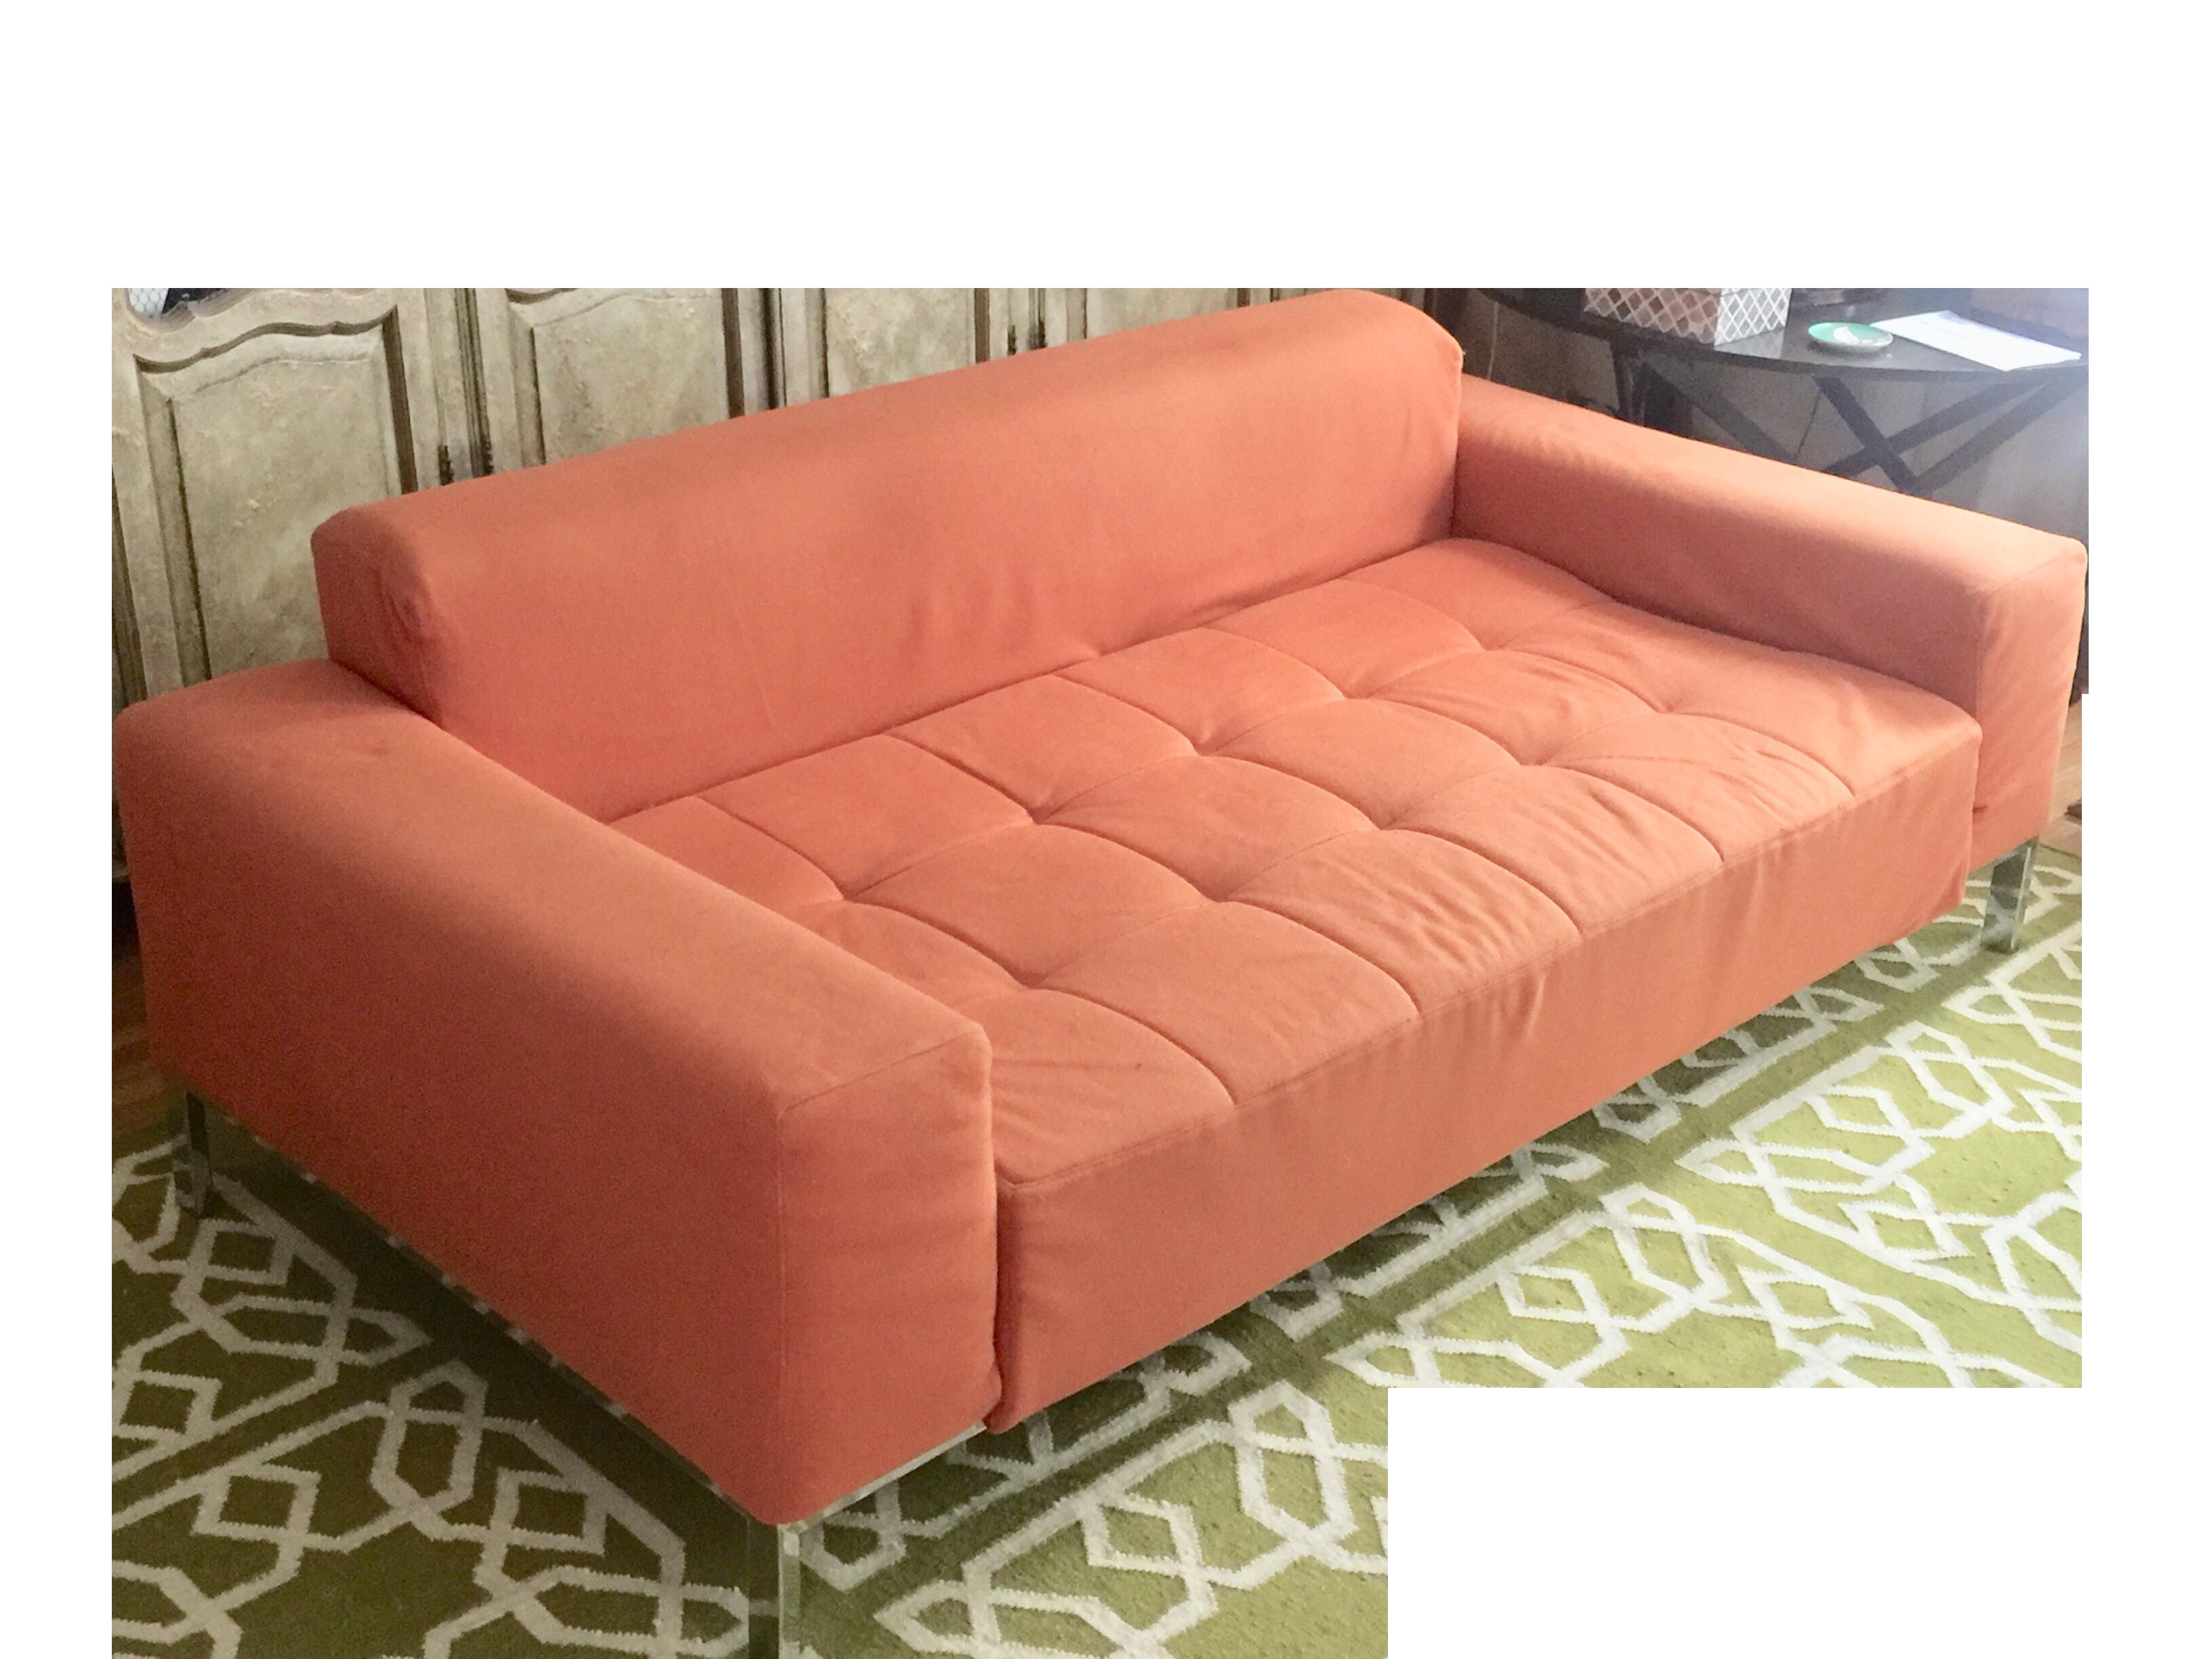 Pleasant Italian Zanotta Alfa Sofa By Emaf Progetti Furniture Unemploymentrelief Wooden Chair Designs For Living Room Unemploymentrelieforg